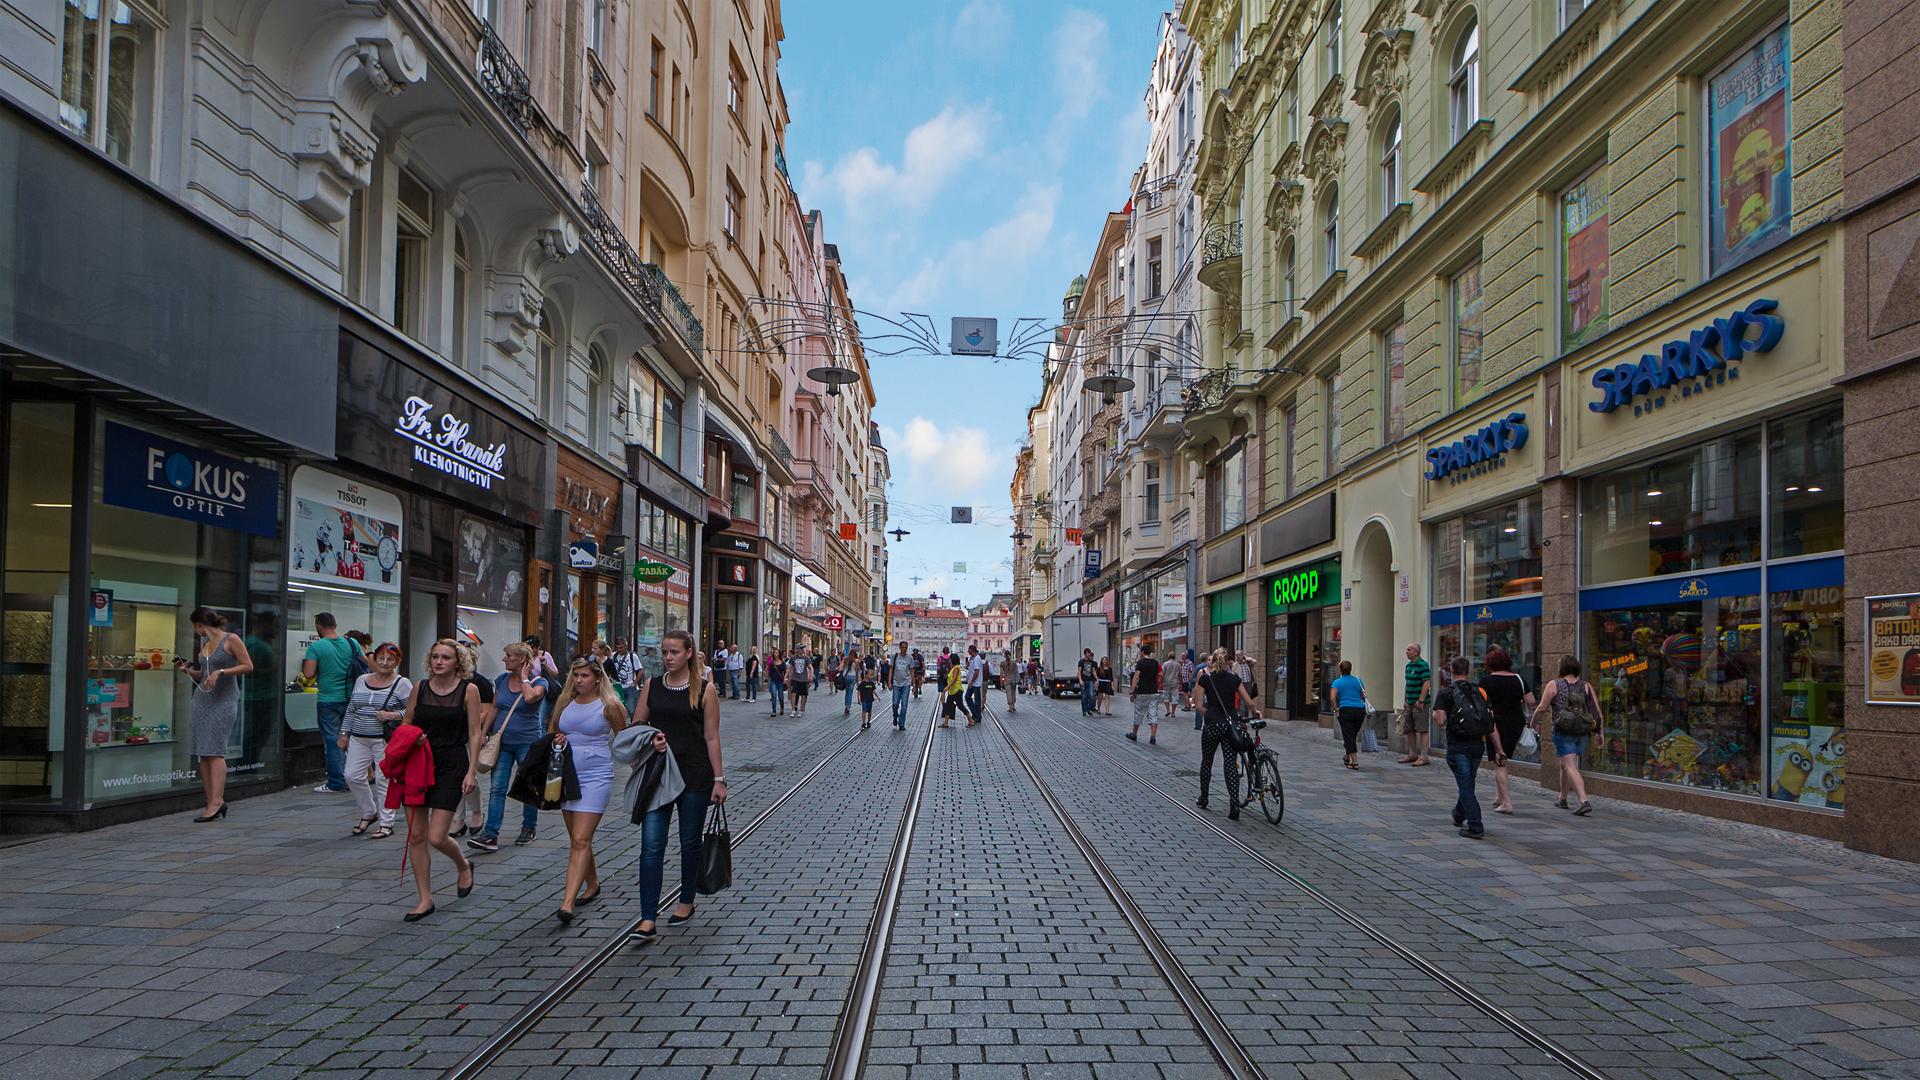 Masarykova Street in Brno